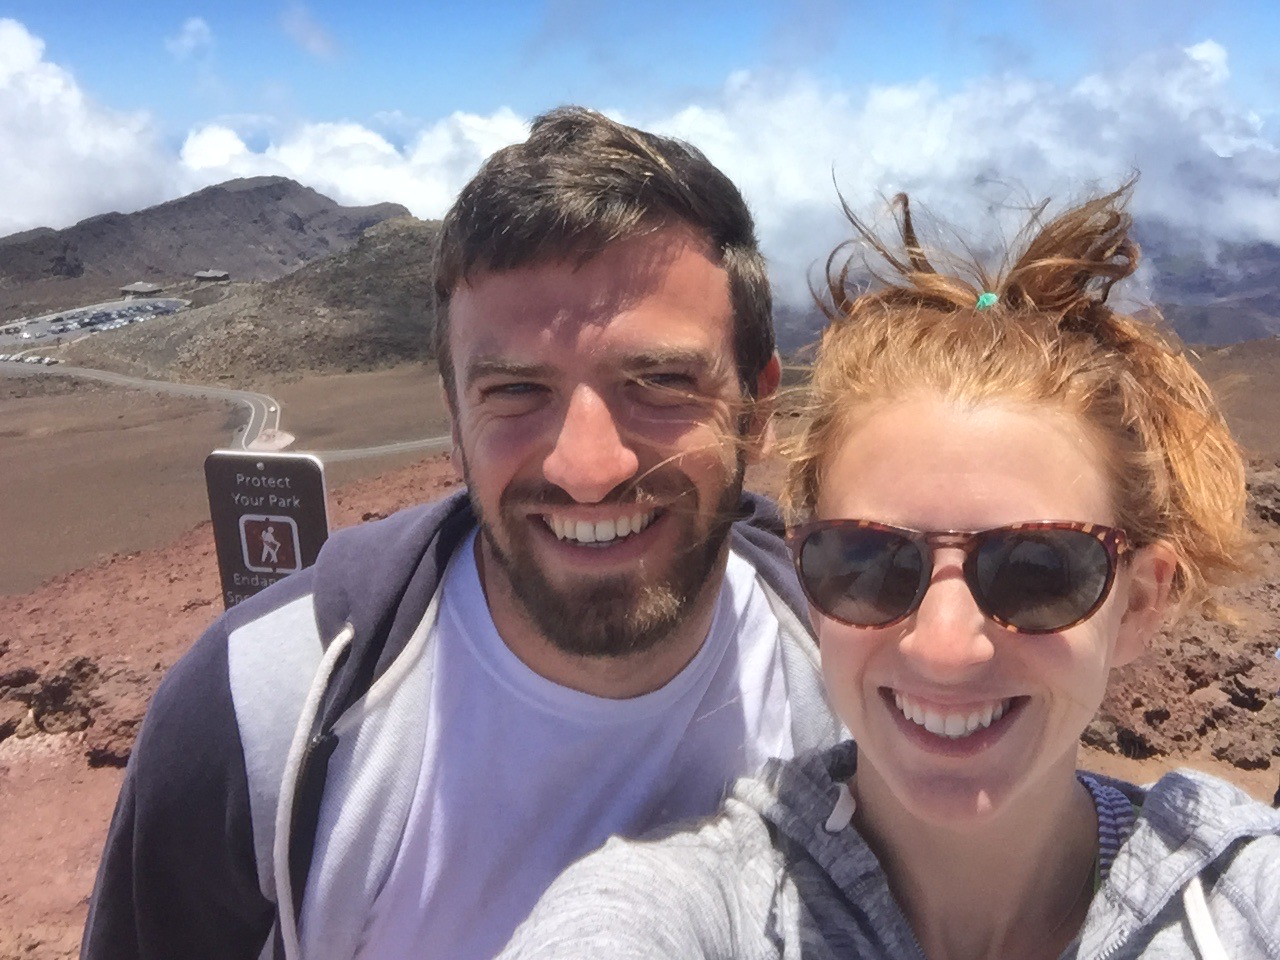 1 YEAR ANNIVERSARY TRIP TO MAUI